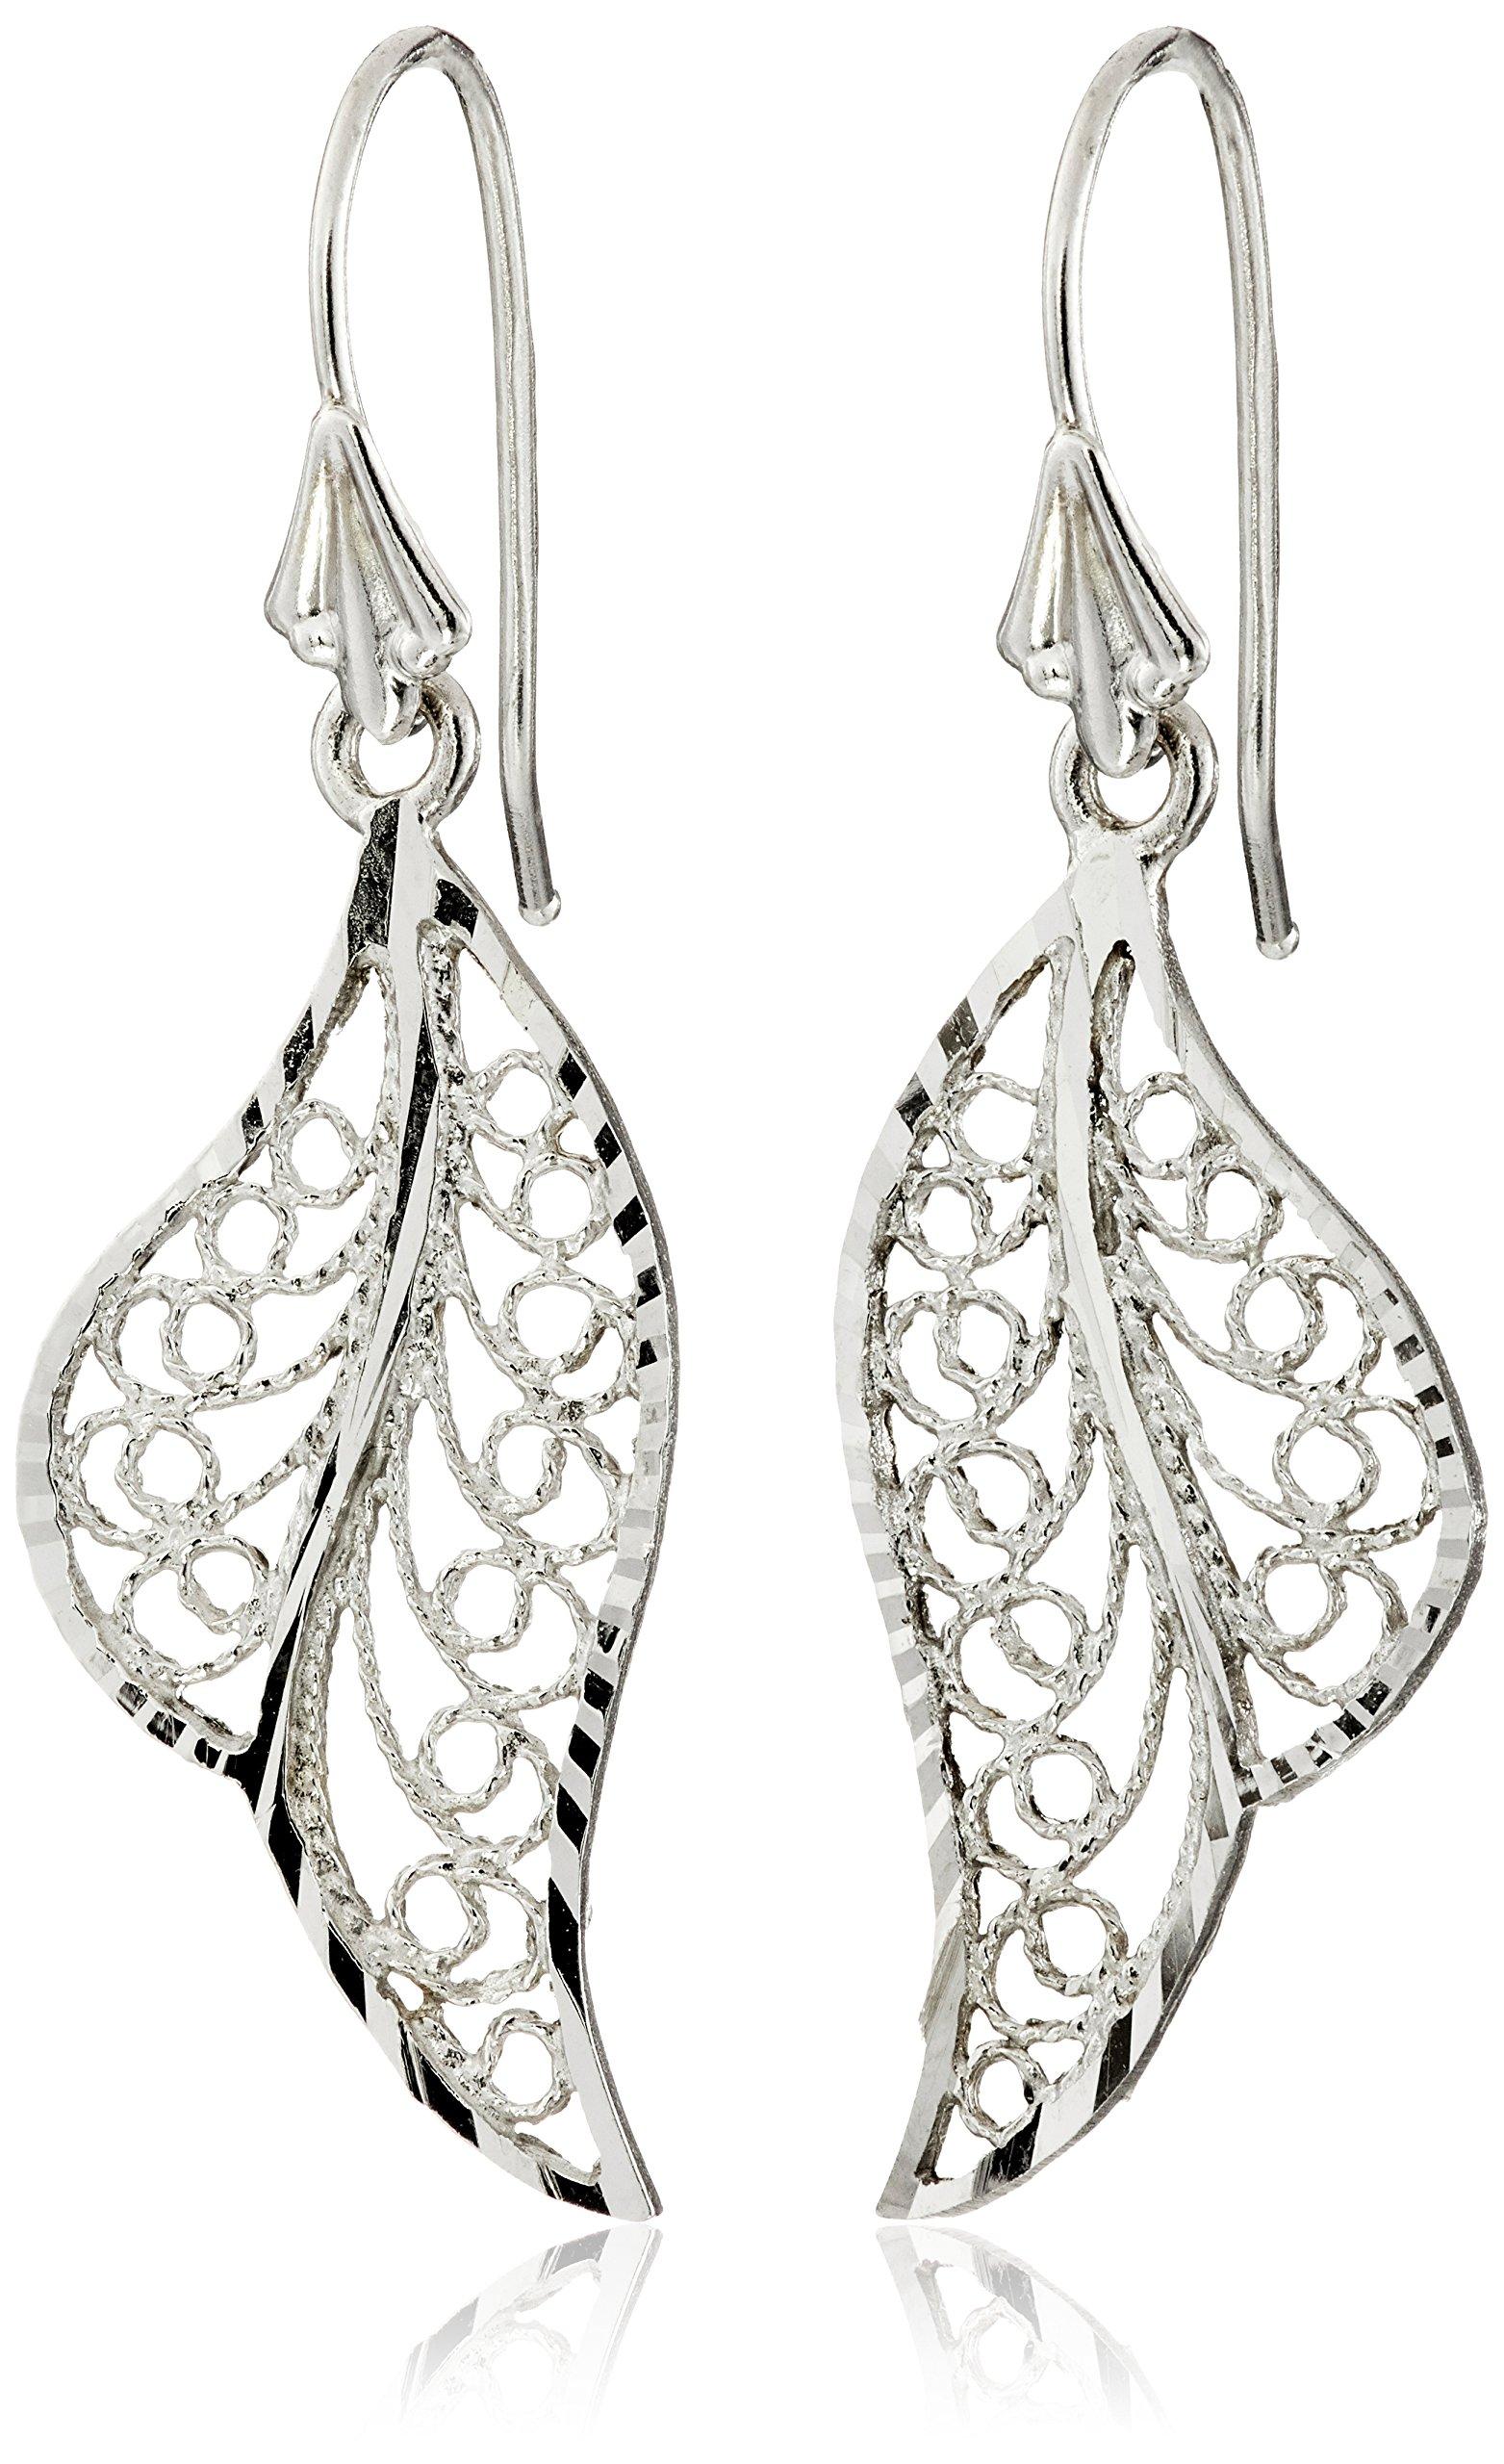 14k White Gold Polished Filigree Drop Earrings